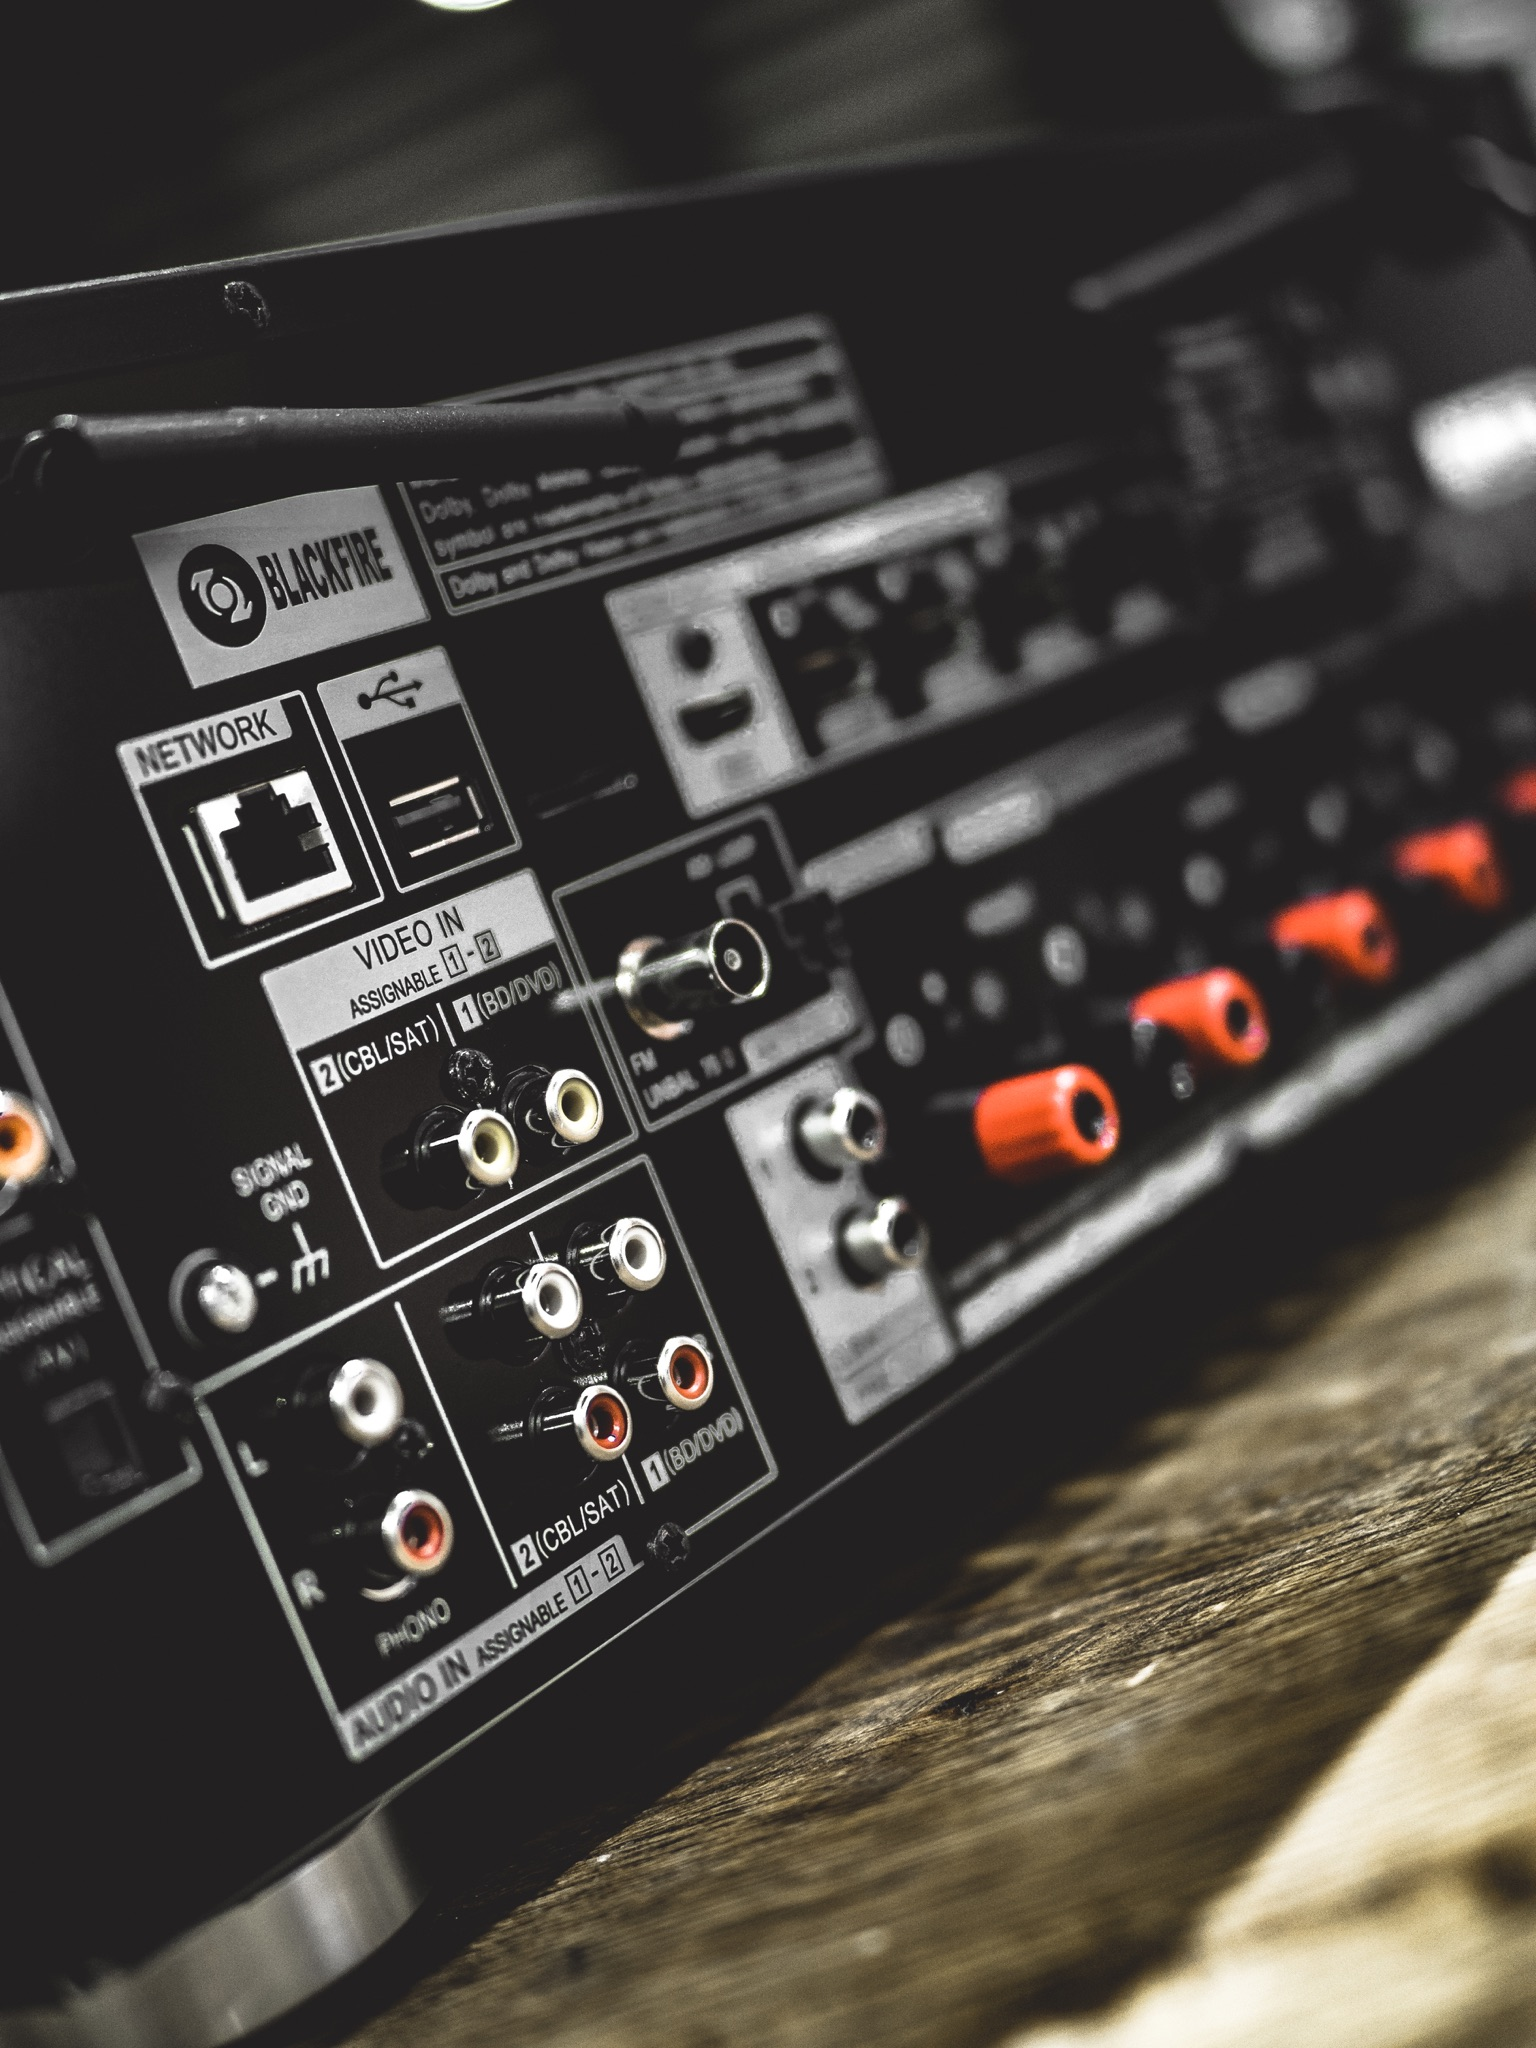 Home Cinema AV Surround Sound Pioneer VSX-932 Receiver Banana Plugs Cable Speaker IO I/O RCA